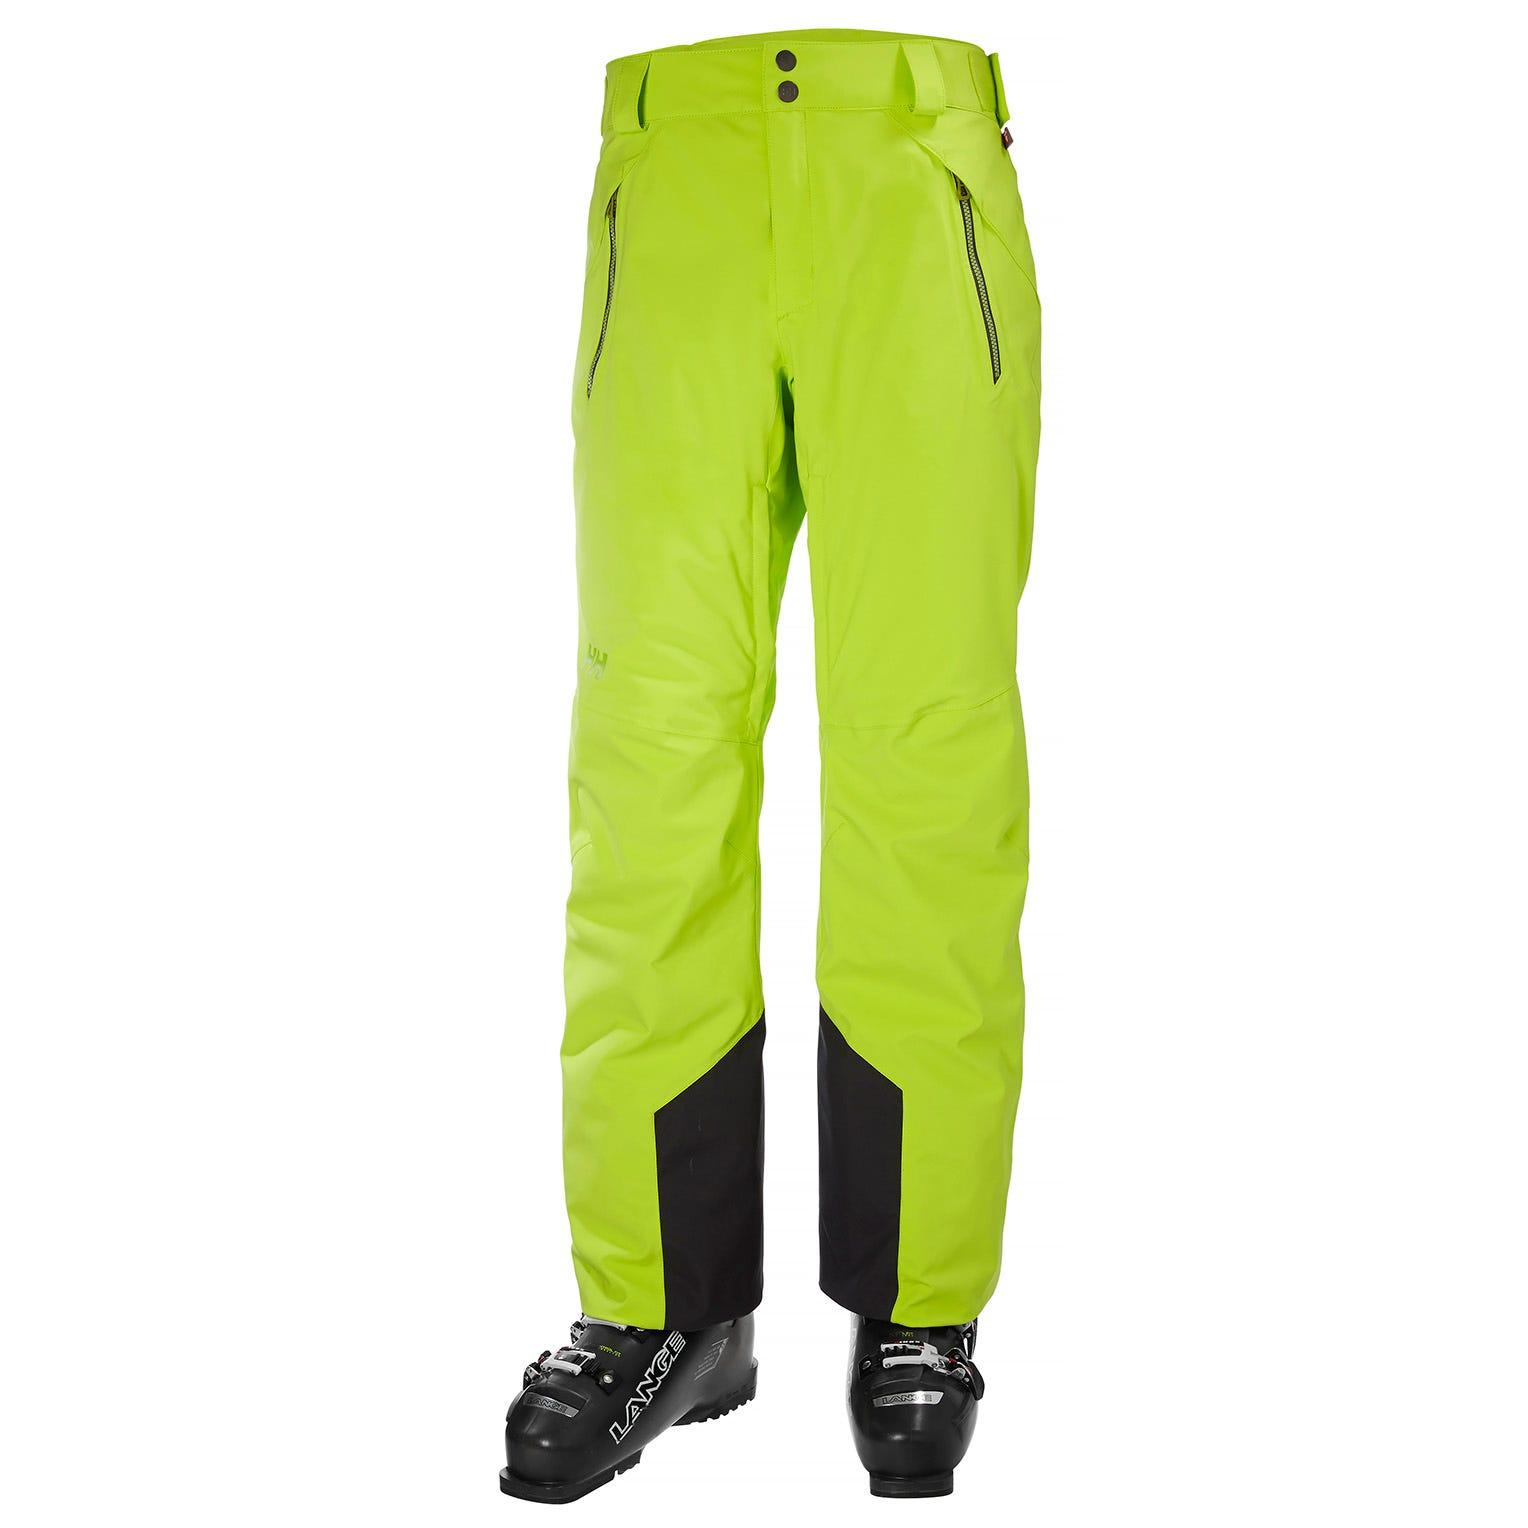 Helly Hansen Mens Force Ski Trouser Green L